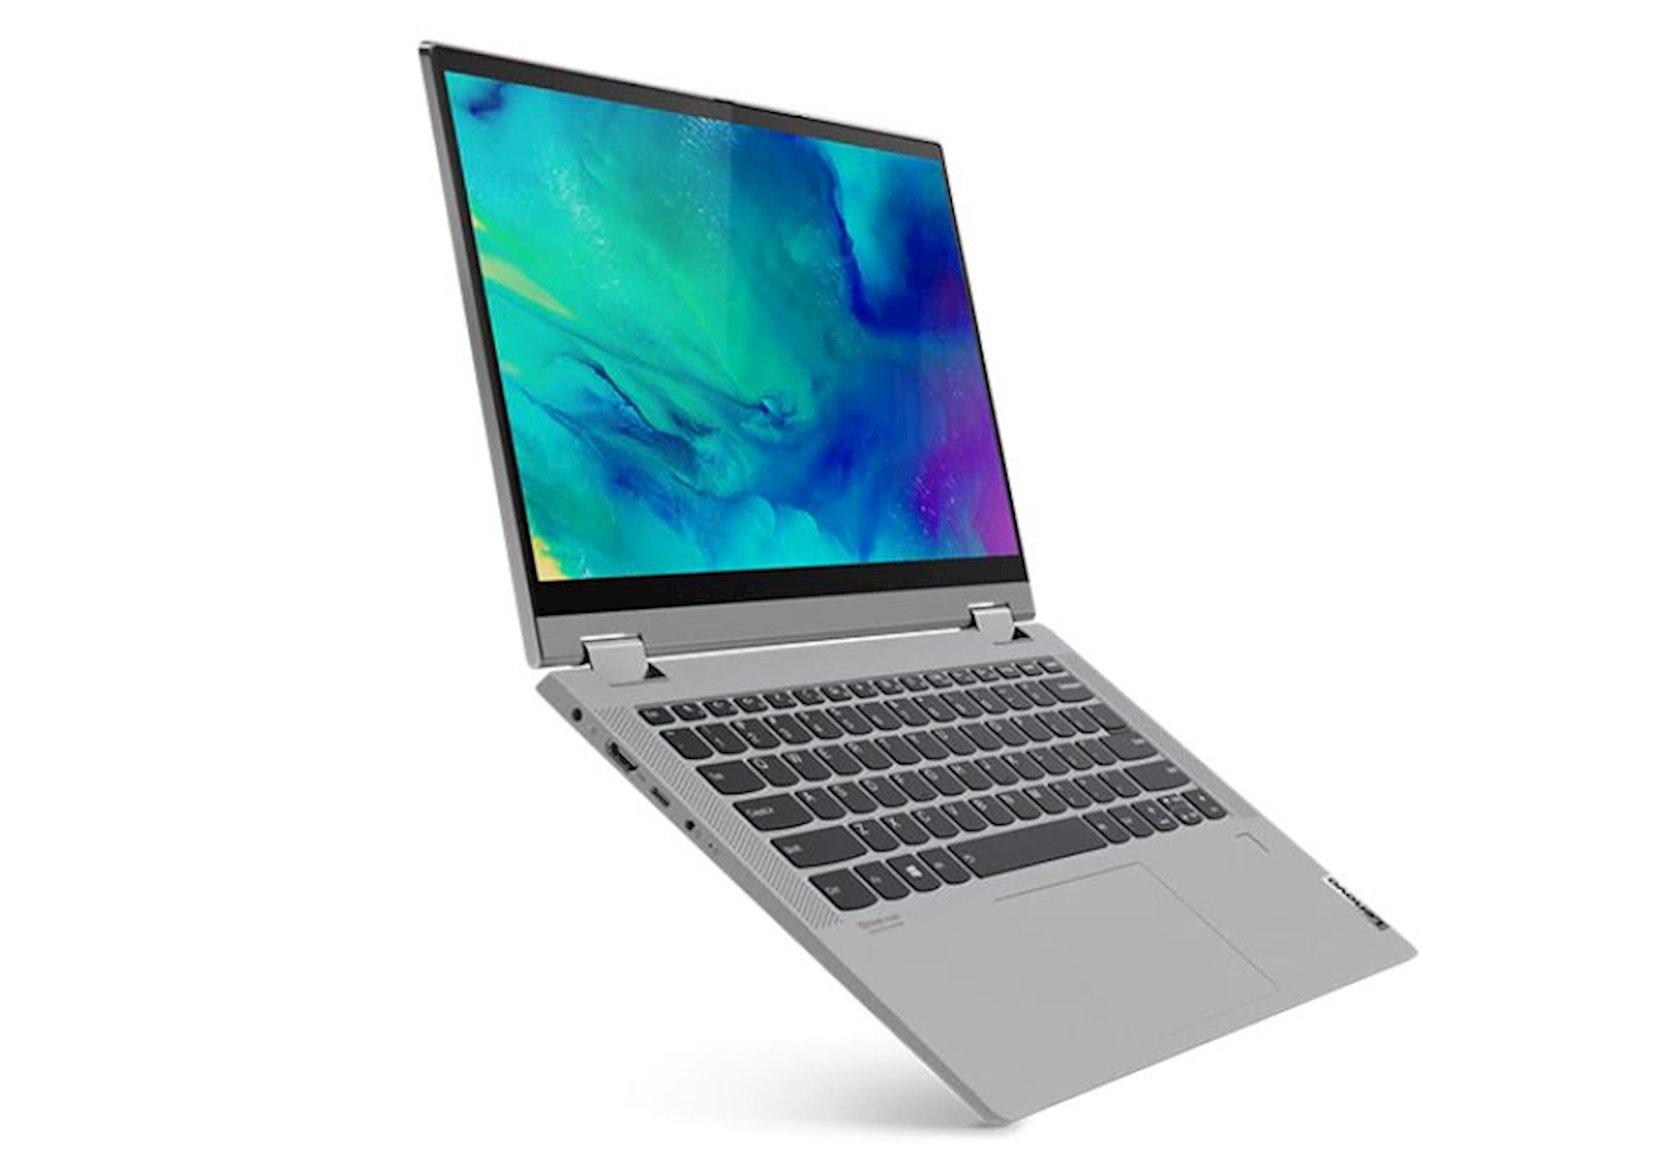 Noutbuk Lenovo IdeaPad Flex 5 14ITL05 (82HS00G1RK)